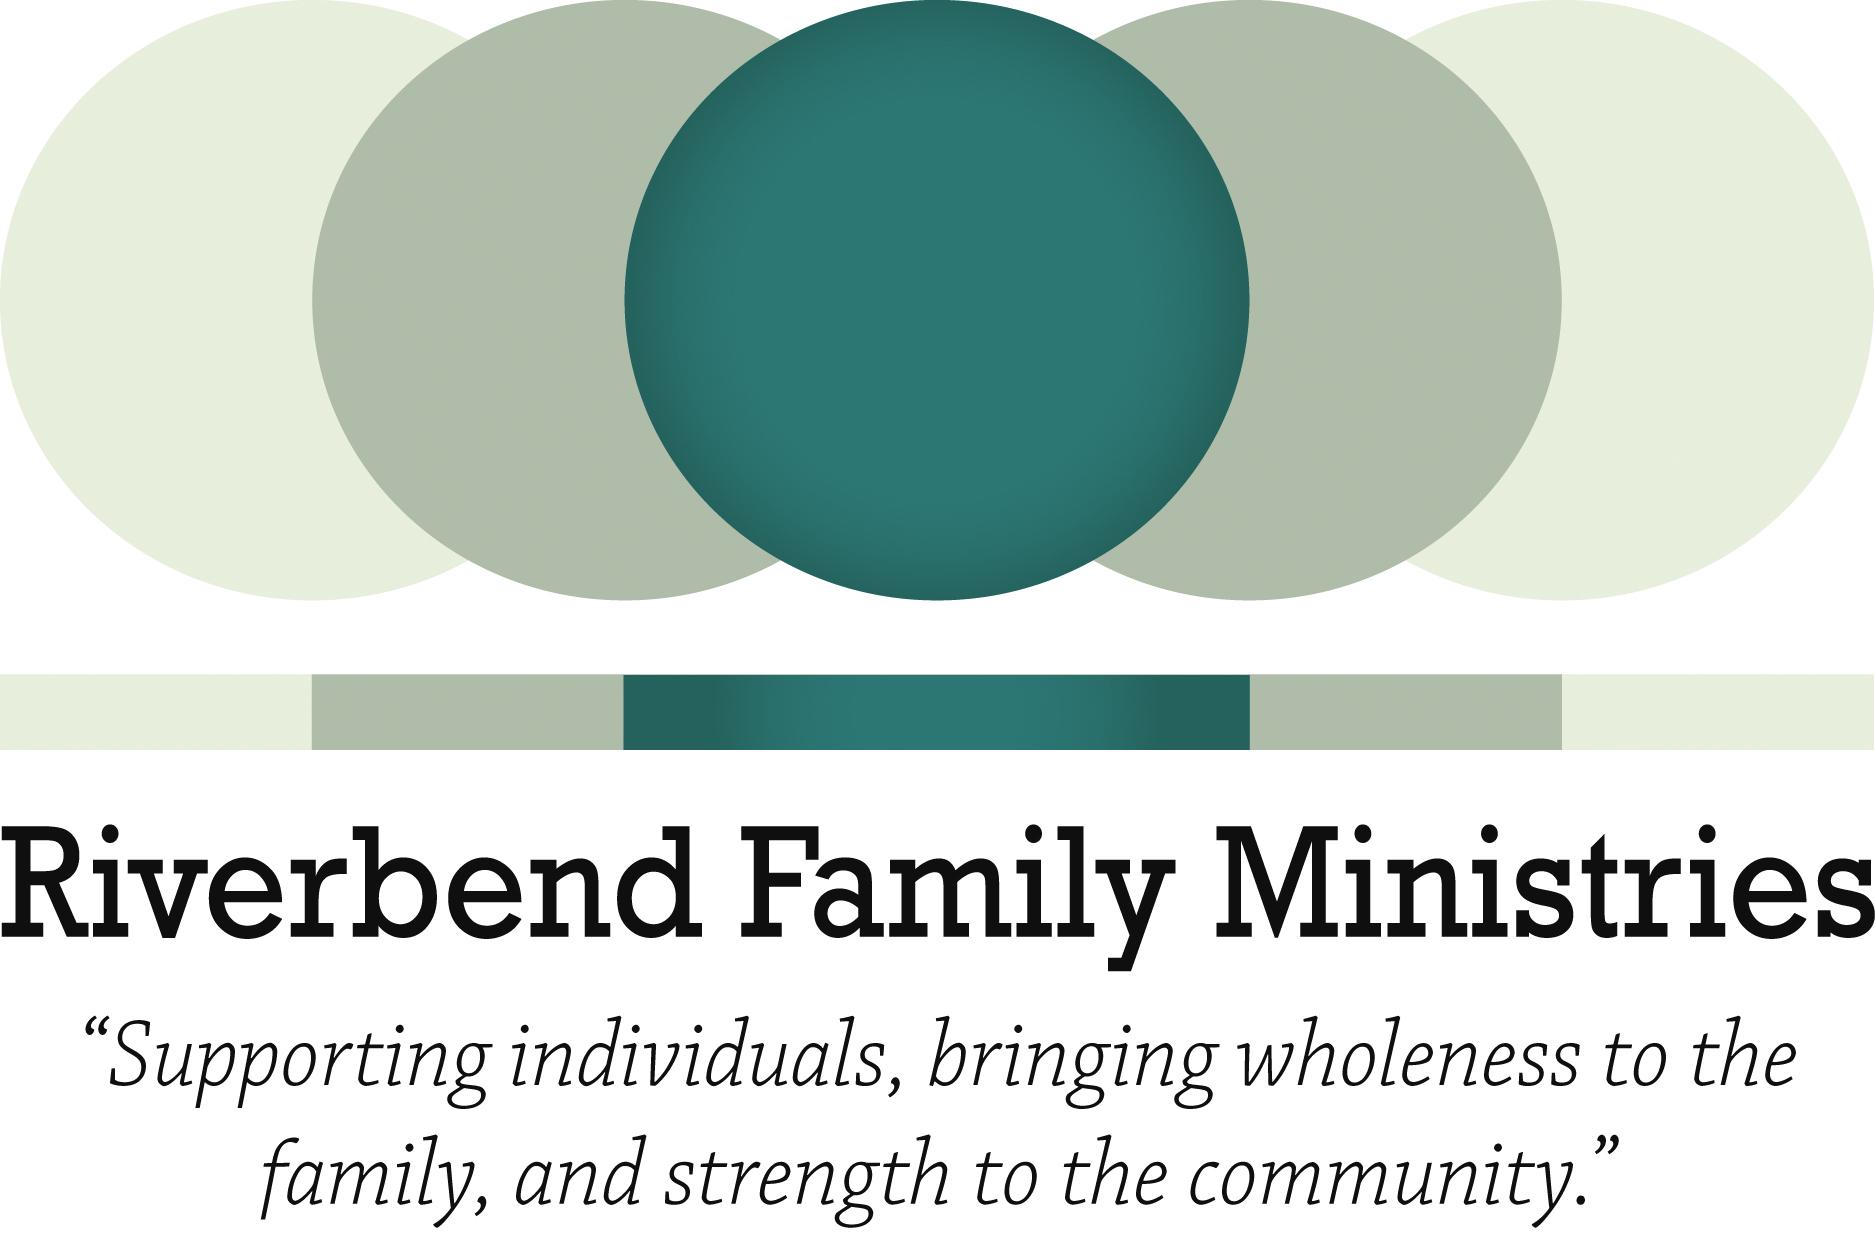 riverbend family ministries logo